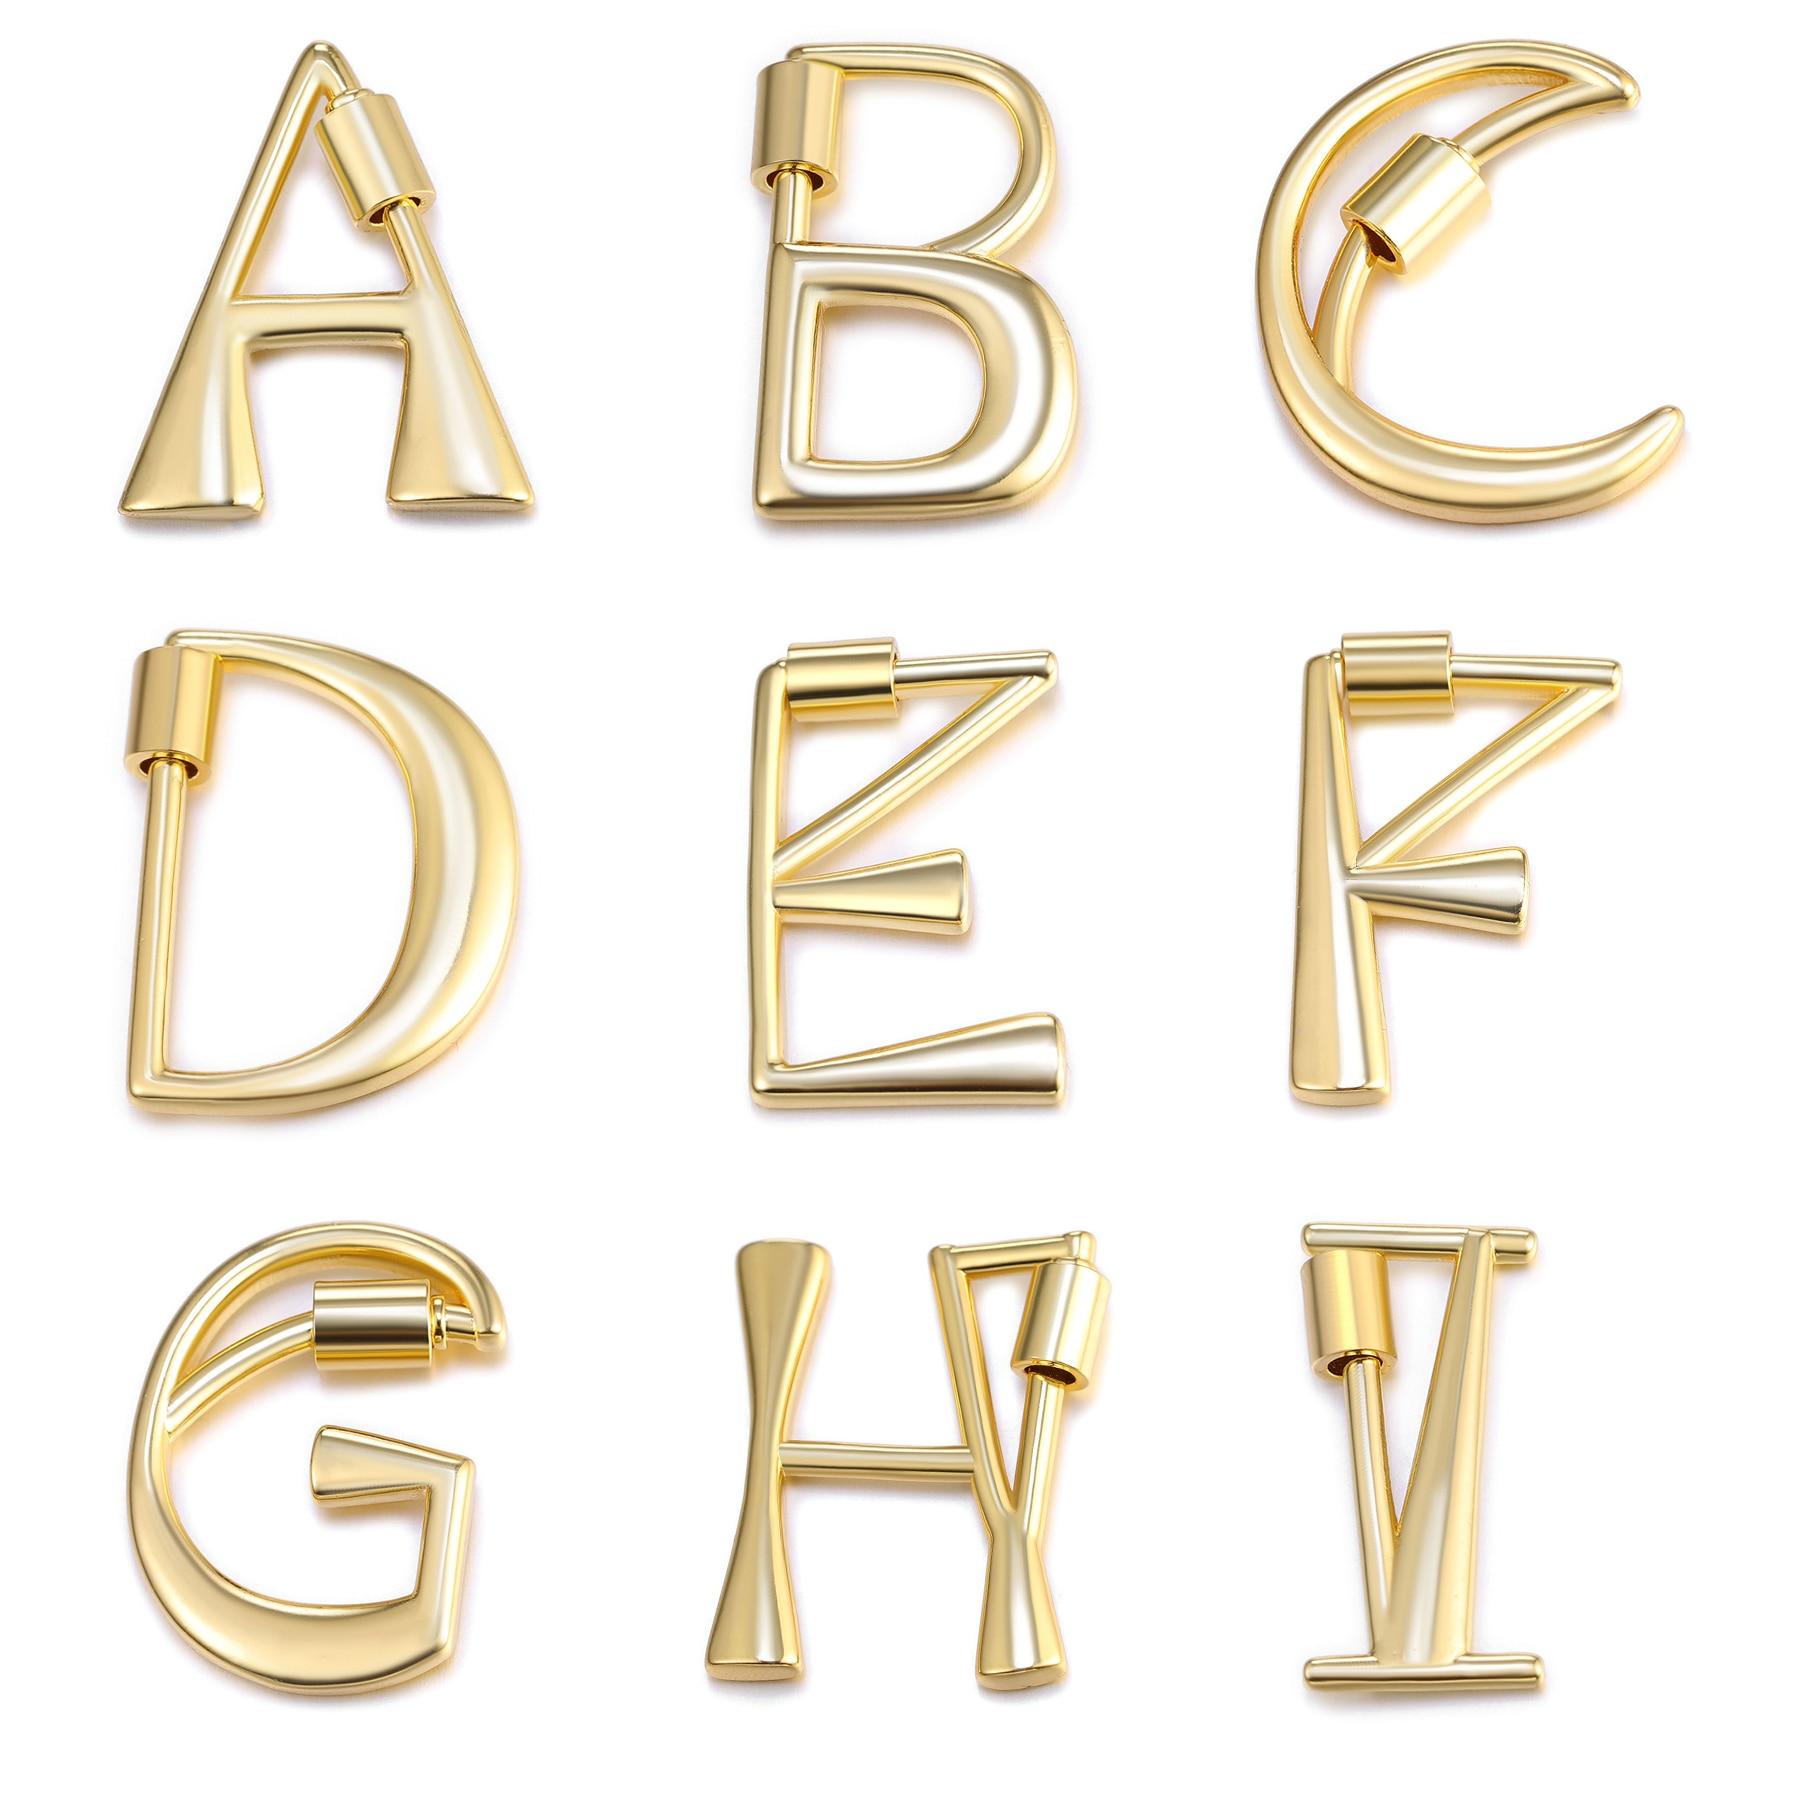 26-Letter Necklaces Alphabet Pendants Gold Color Copper Mini A-Z Letter Pendant Necklace Shinning 26 Initial Collares Jewelry